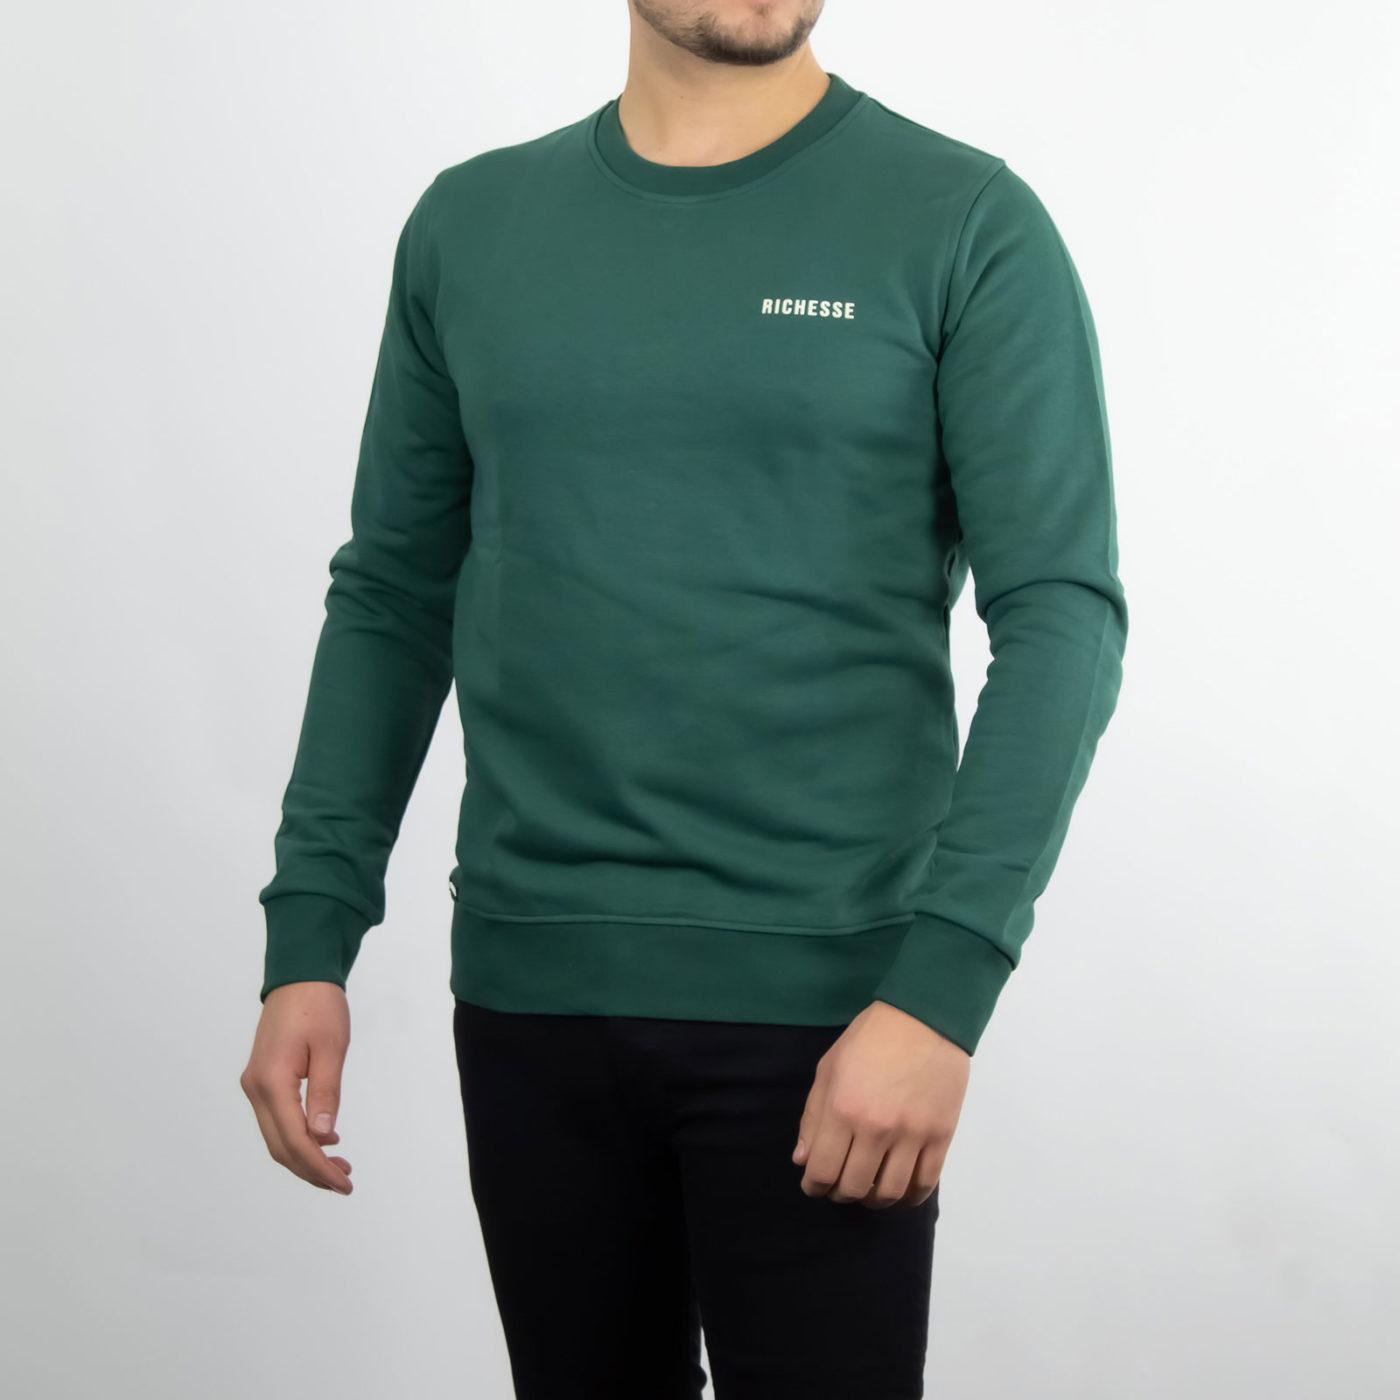 Richesse-Crewneck-Green-2